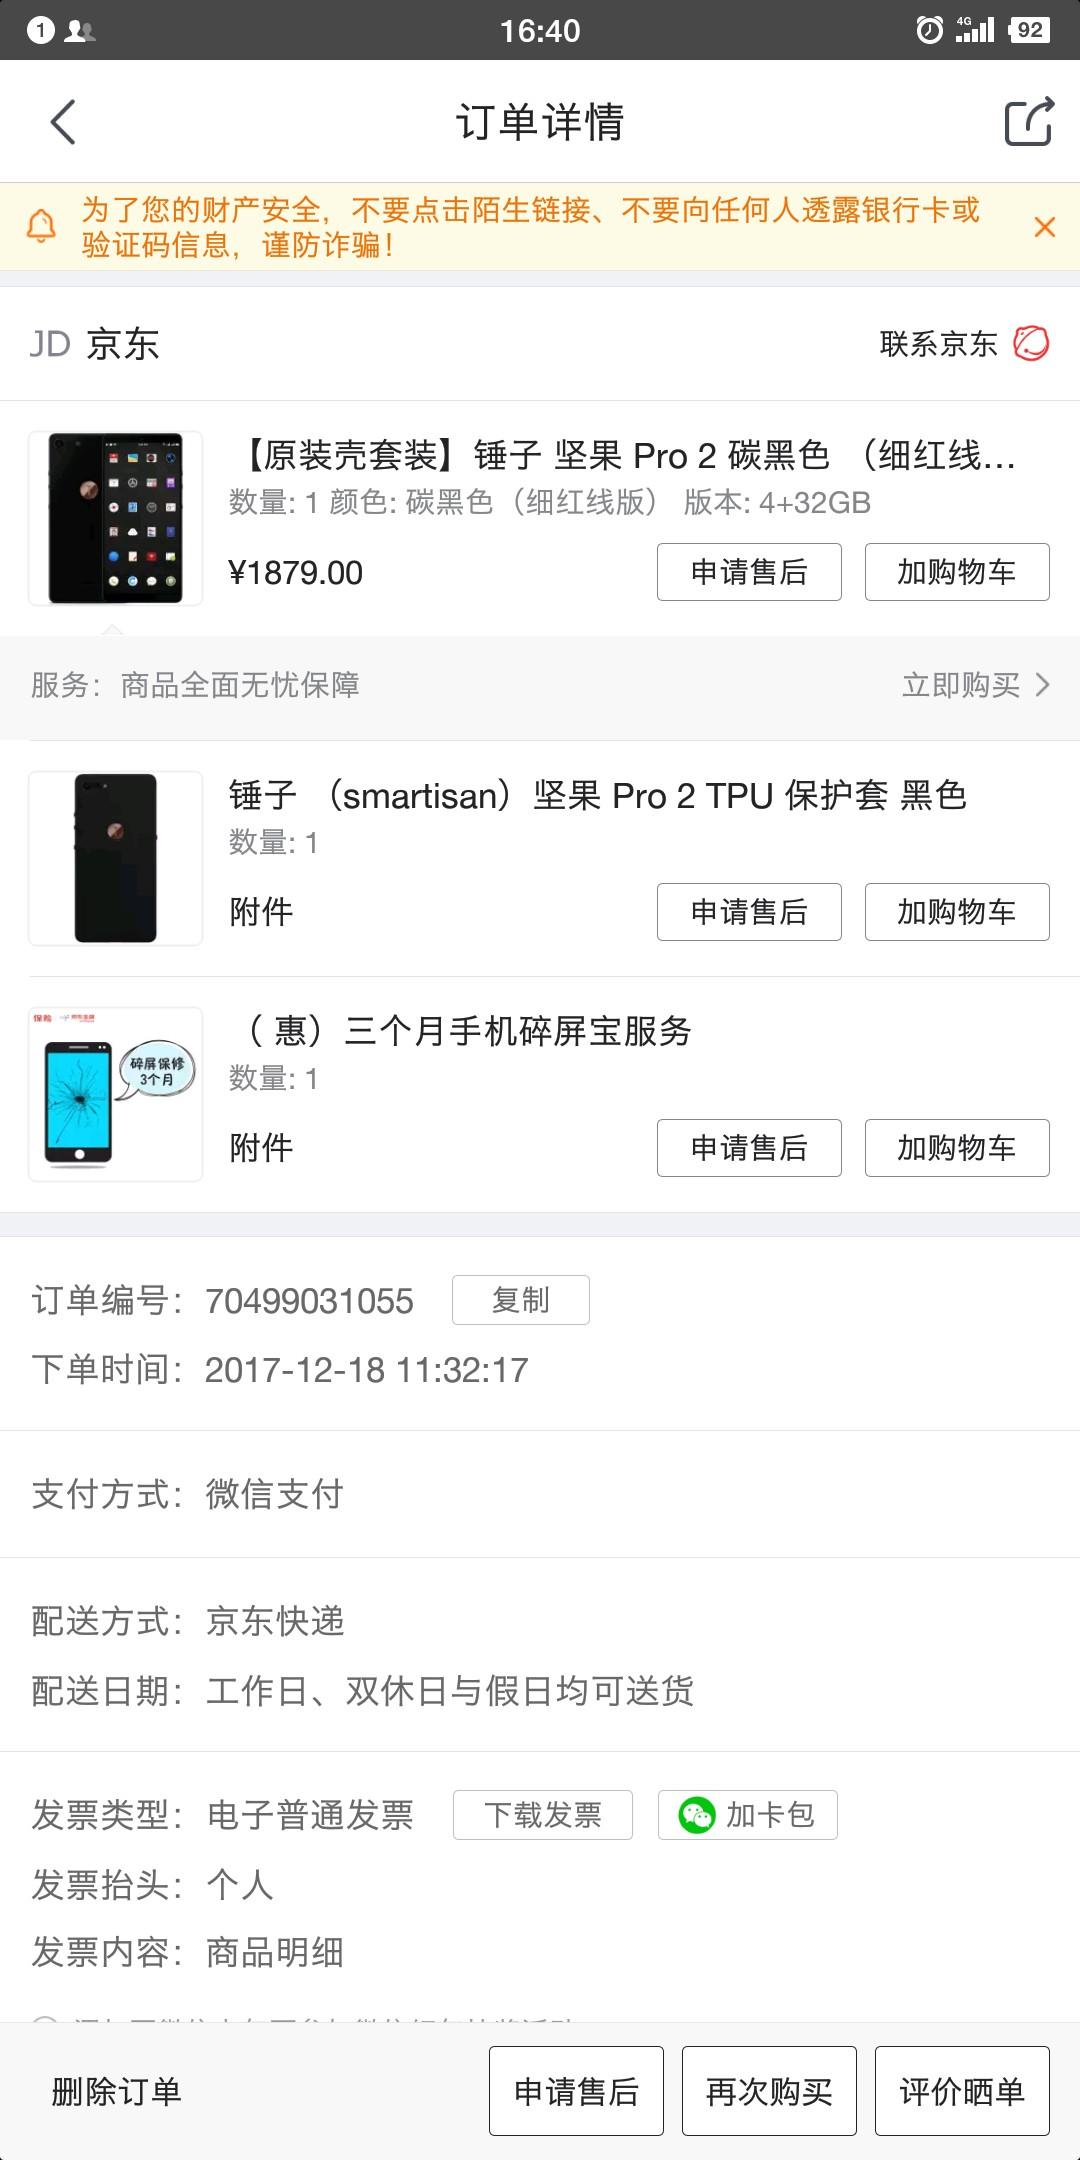 Screenshot_2017-12-20-16-40-35-559_??.png